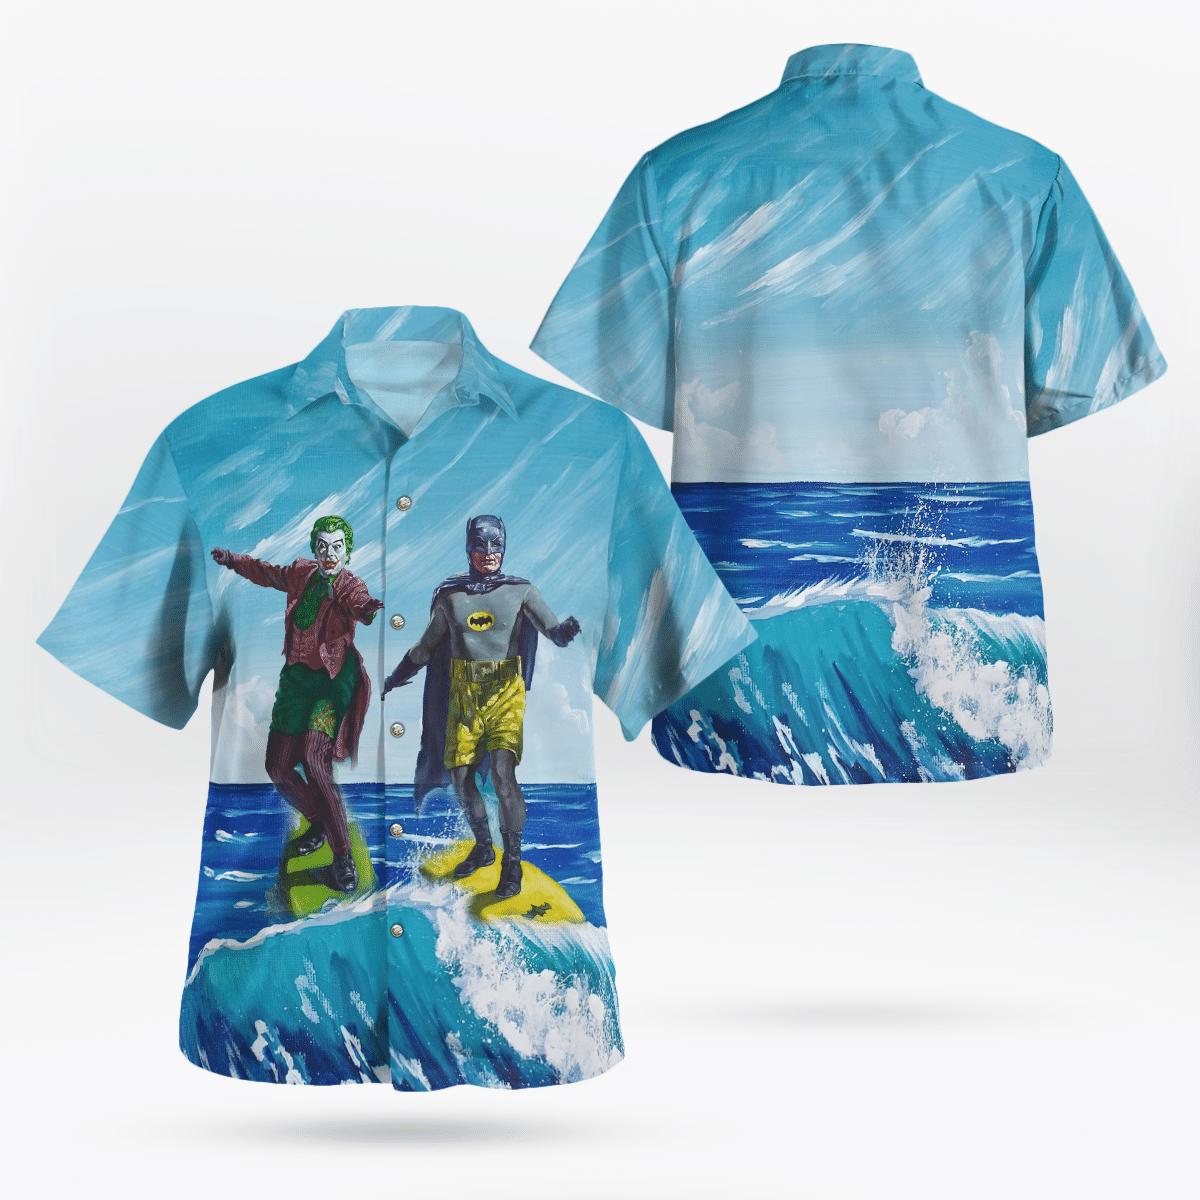 Duel Surfing Batman and Joker Hawaiian Shirt and Shorts